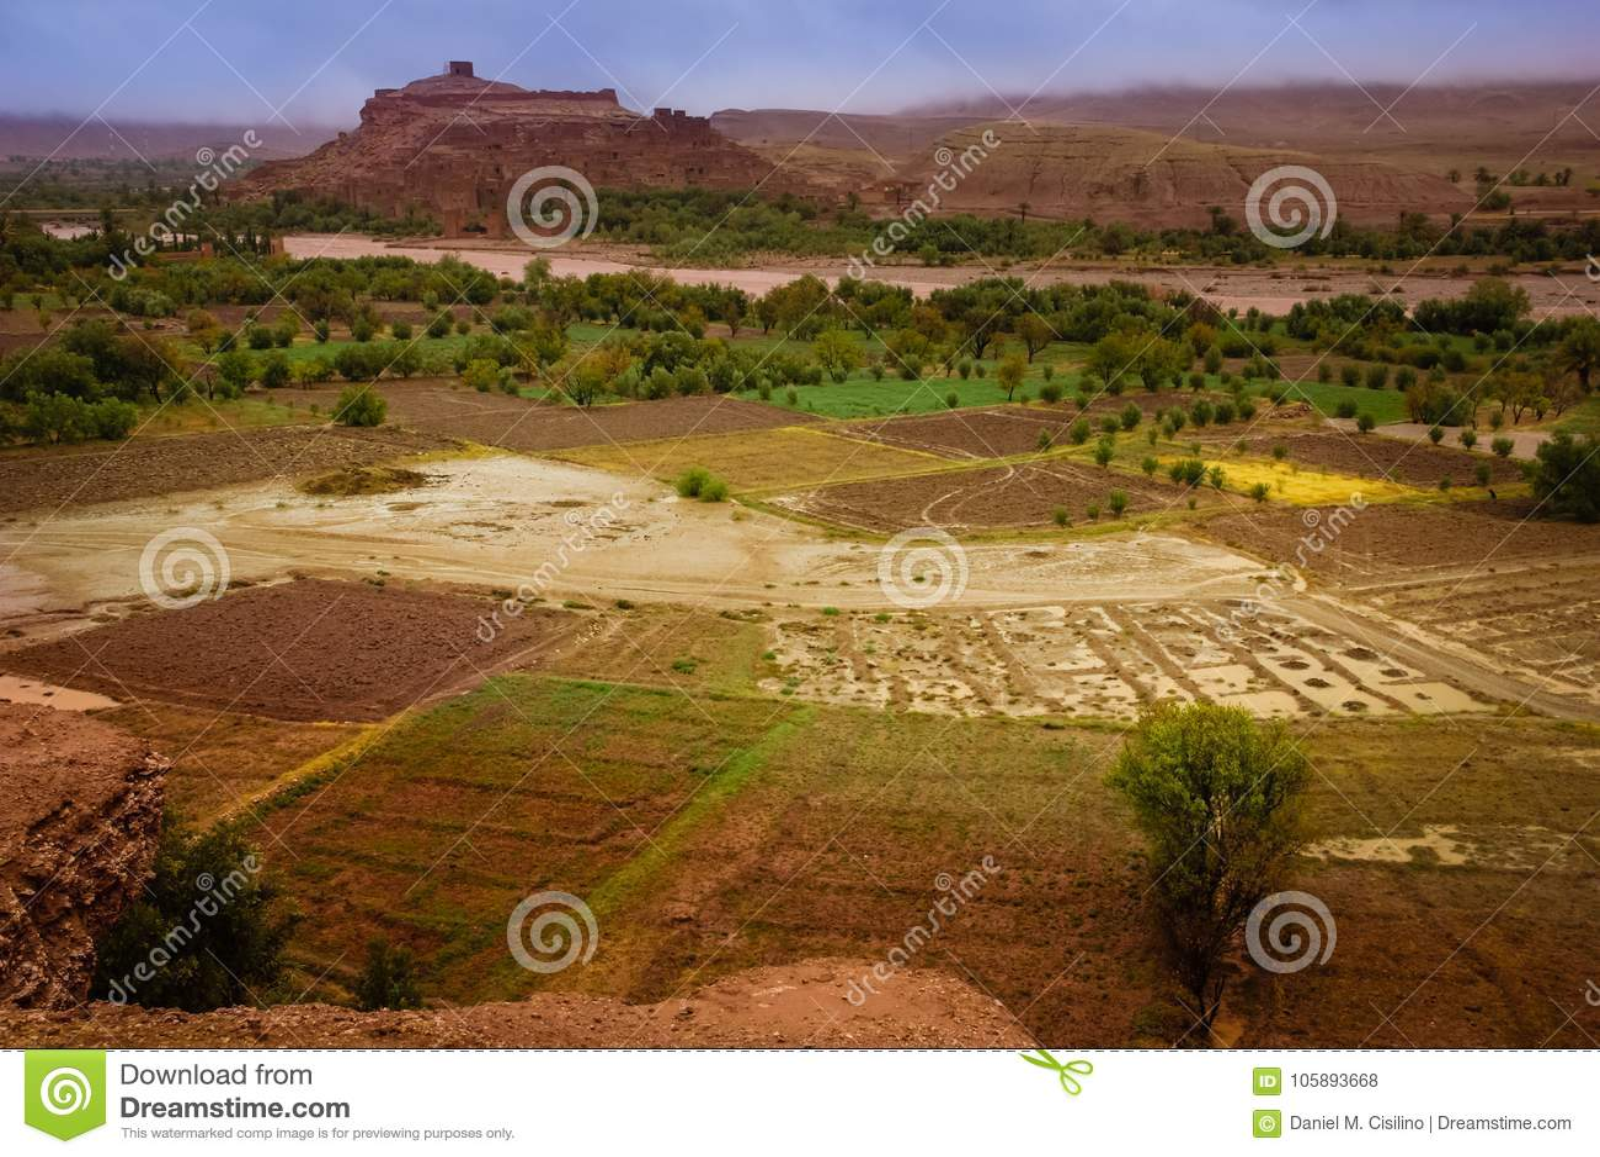 Vale do ounila de Asif Haddou de Kasbah AIT ben marrocos